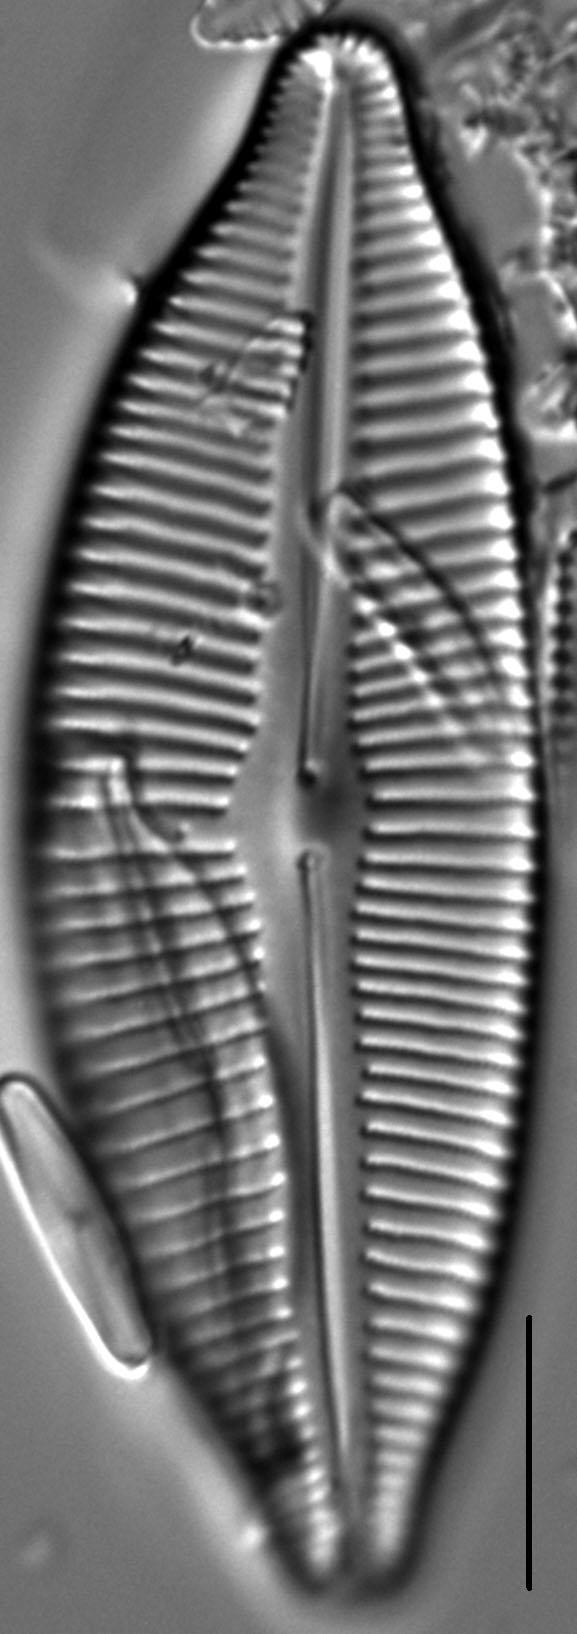 Cymbopleura lata LM5